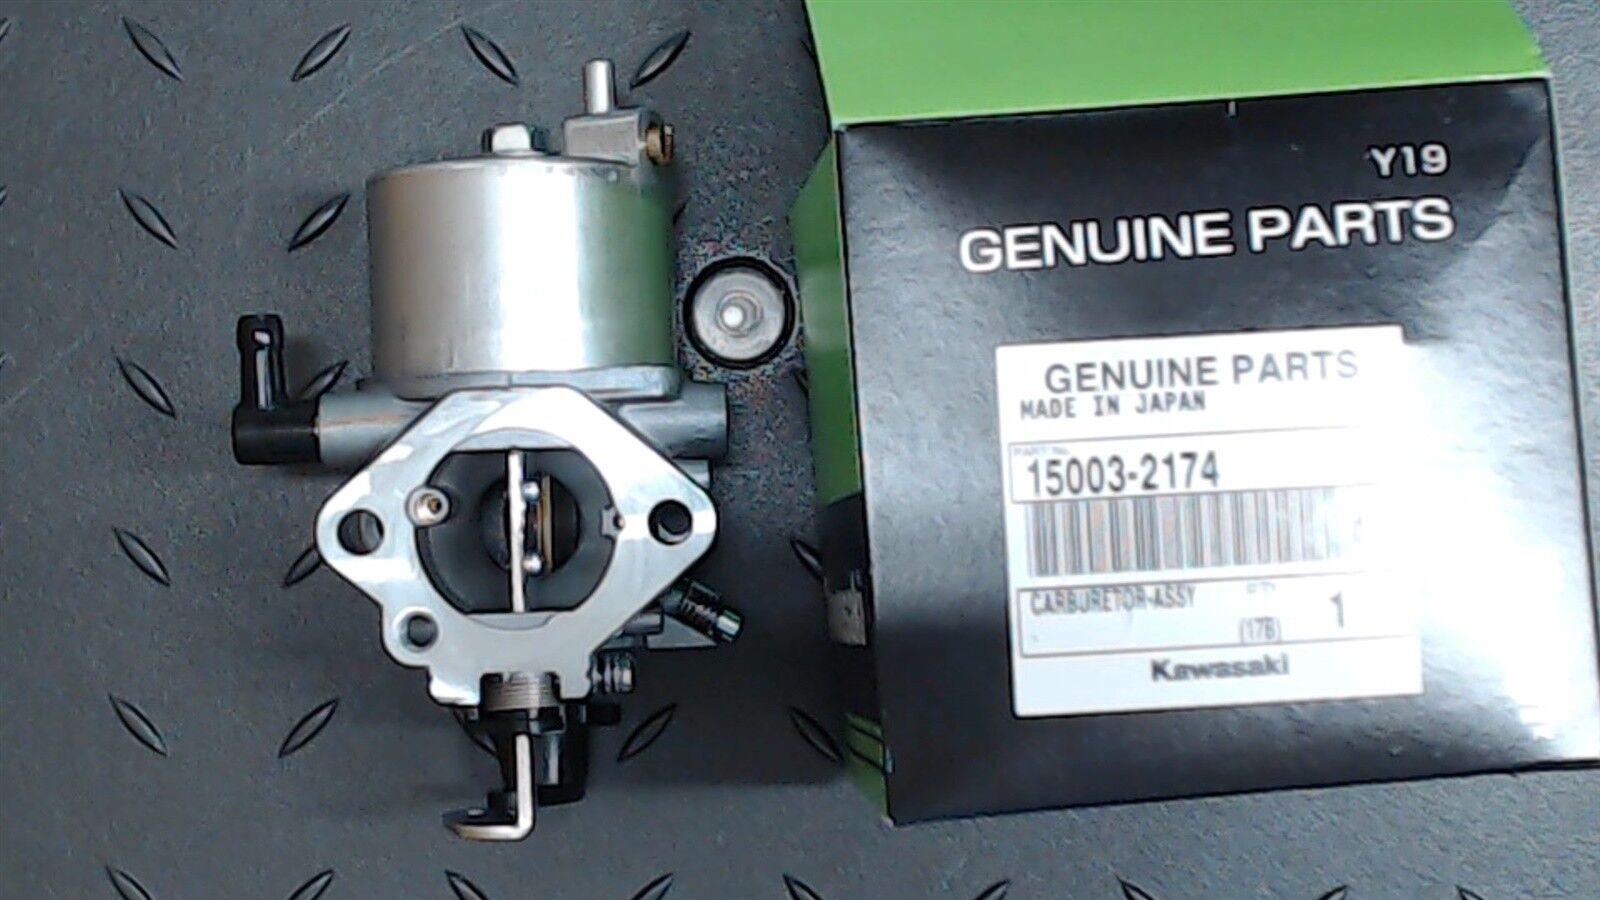 Genuine Oem Kawasaki Cocheburador-ASSY 15003-2150 15003-2174